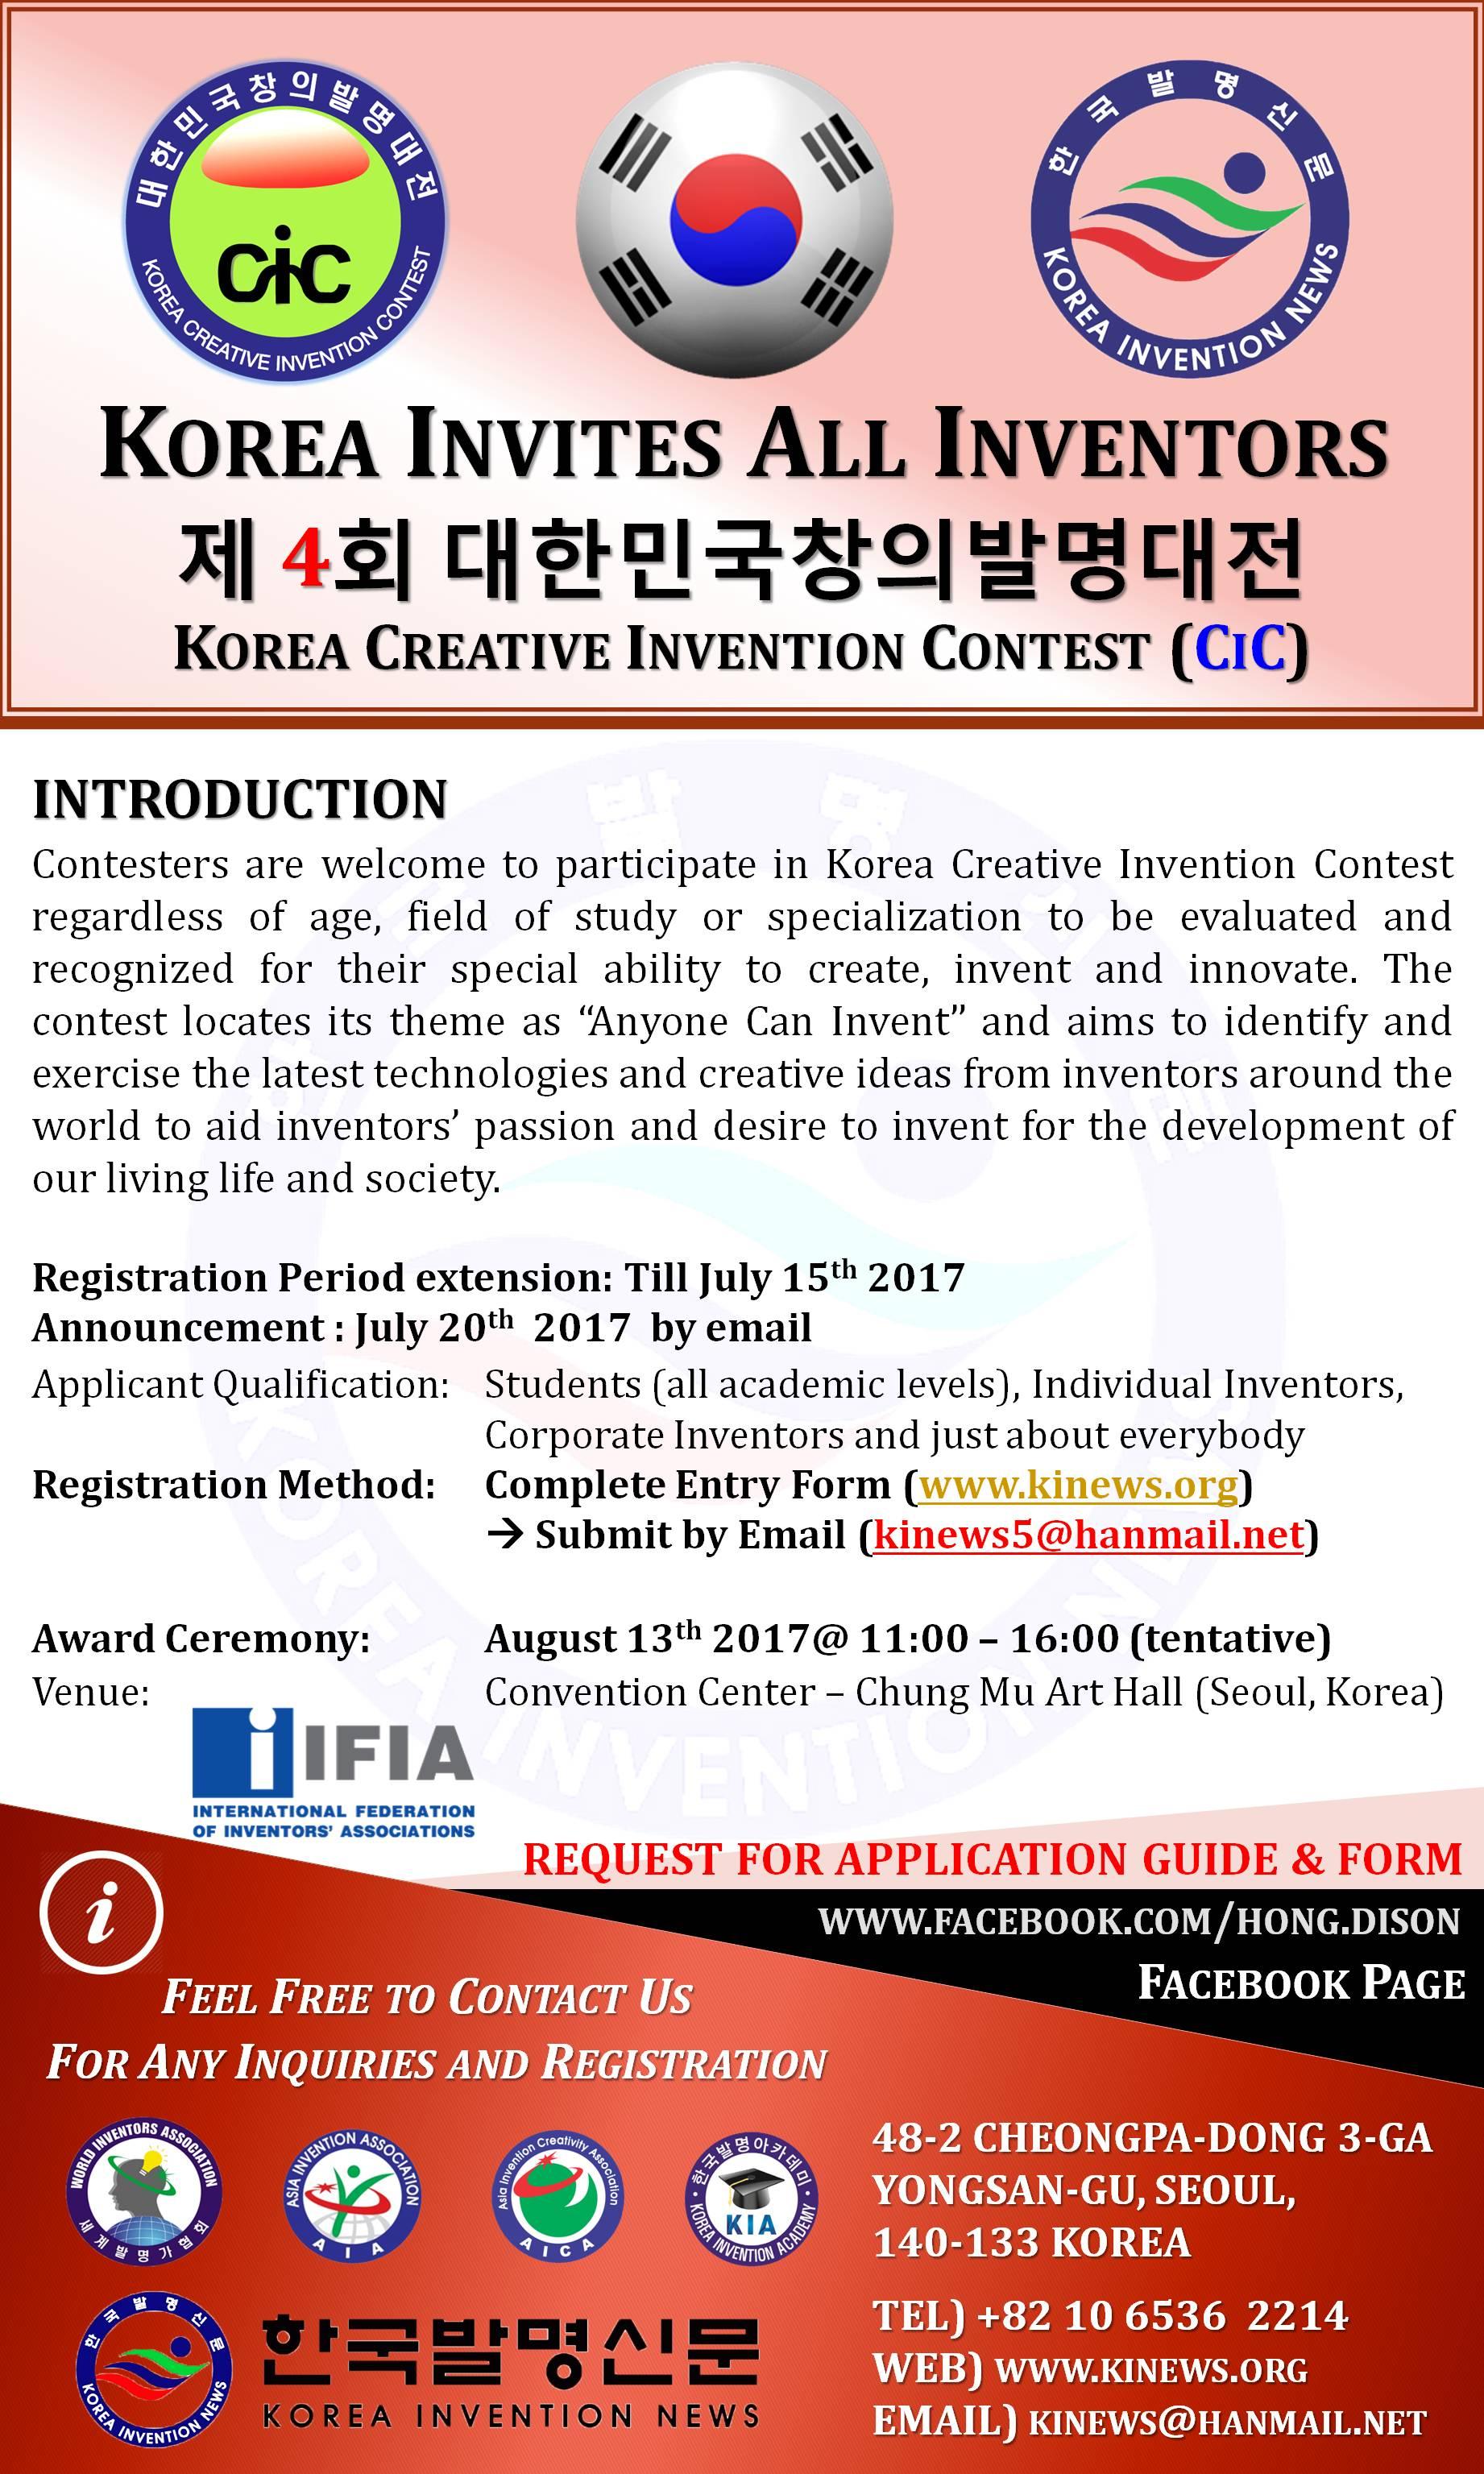 korea creative invention contest, cic 2017